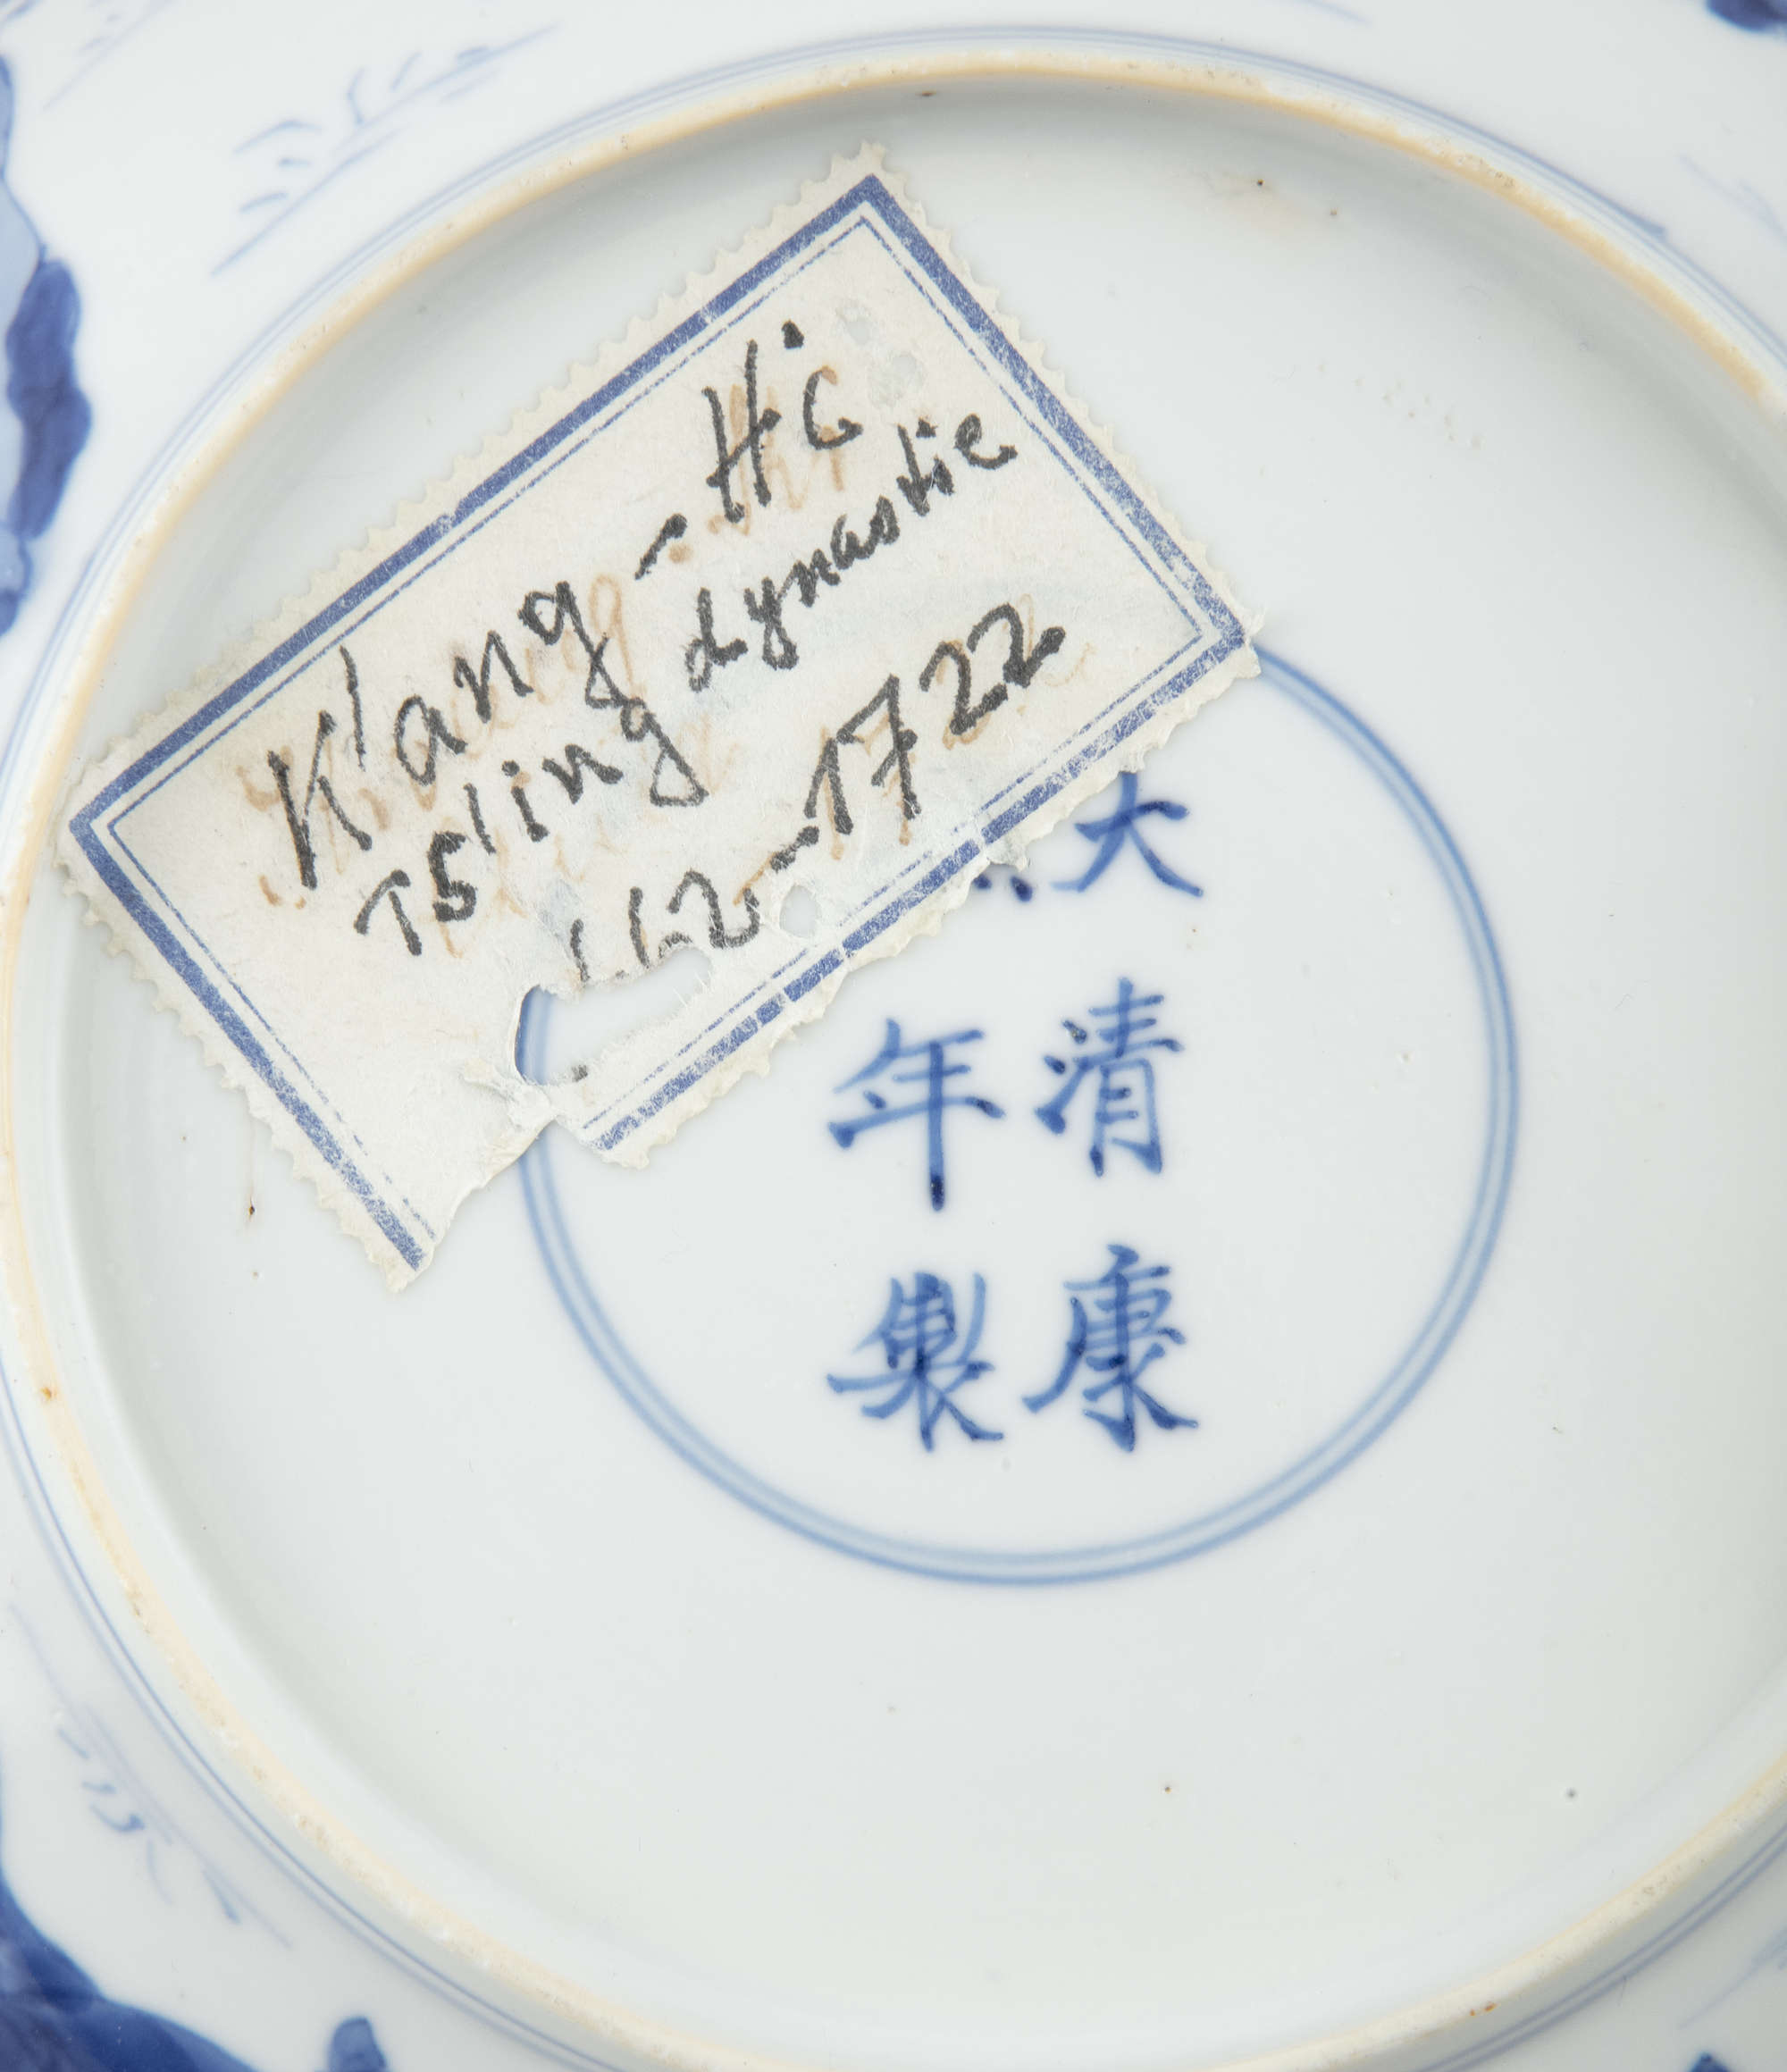 A BLUE AND WHITE 'EIGHT HORSES OF WANG MU' PORCELAIN DISH China, Qing Dynasty, Kangxi mark and - Image 7 of 17